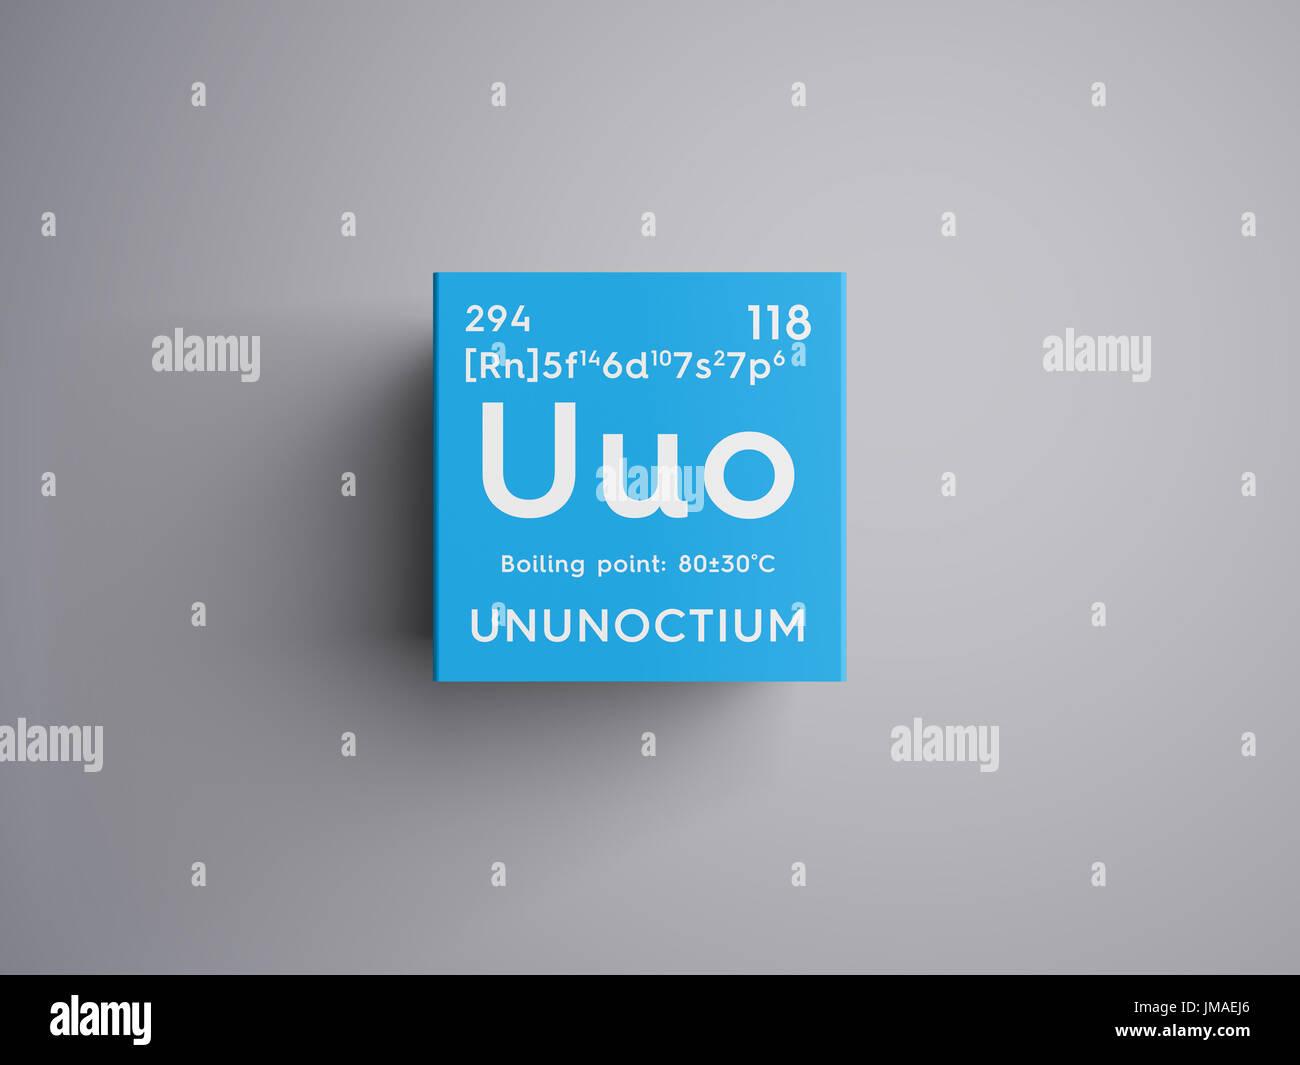 Ununoctium los gases nobles elemento qumico de la tabla peridica los gases nobles elemento qumico de la tabla peridica de mendeleyev en ununoctium square cube concepto creativo urtaz Image collections